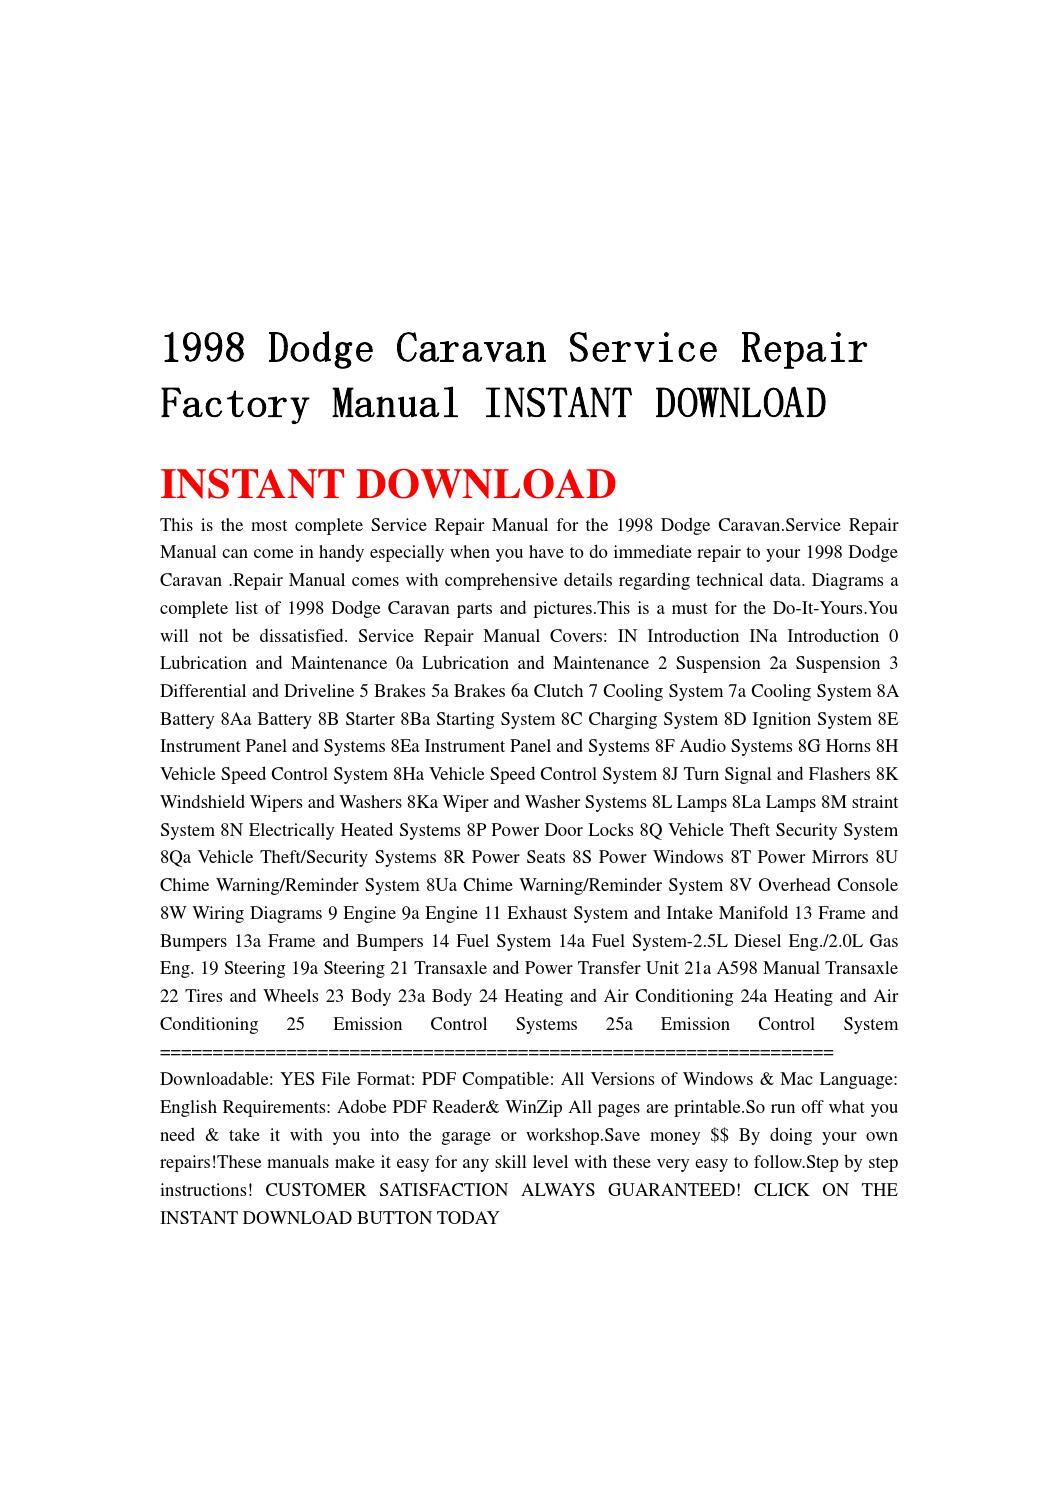 1998 dodge caravan service repair factory manual instant download by  jshenfnne - issuu